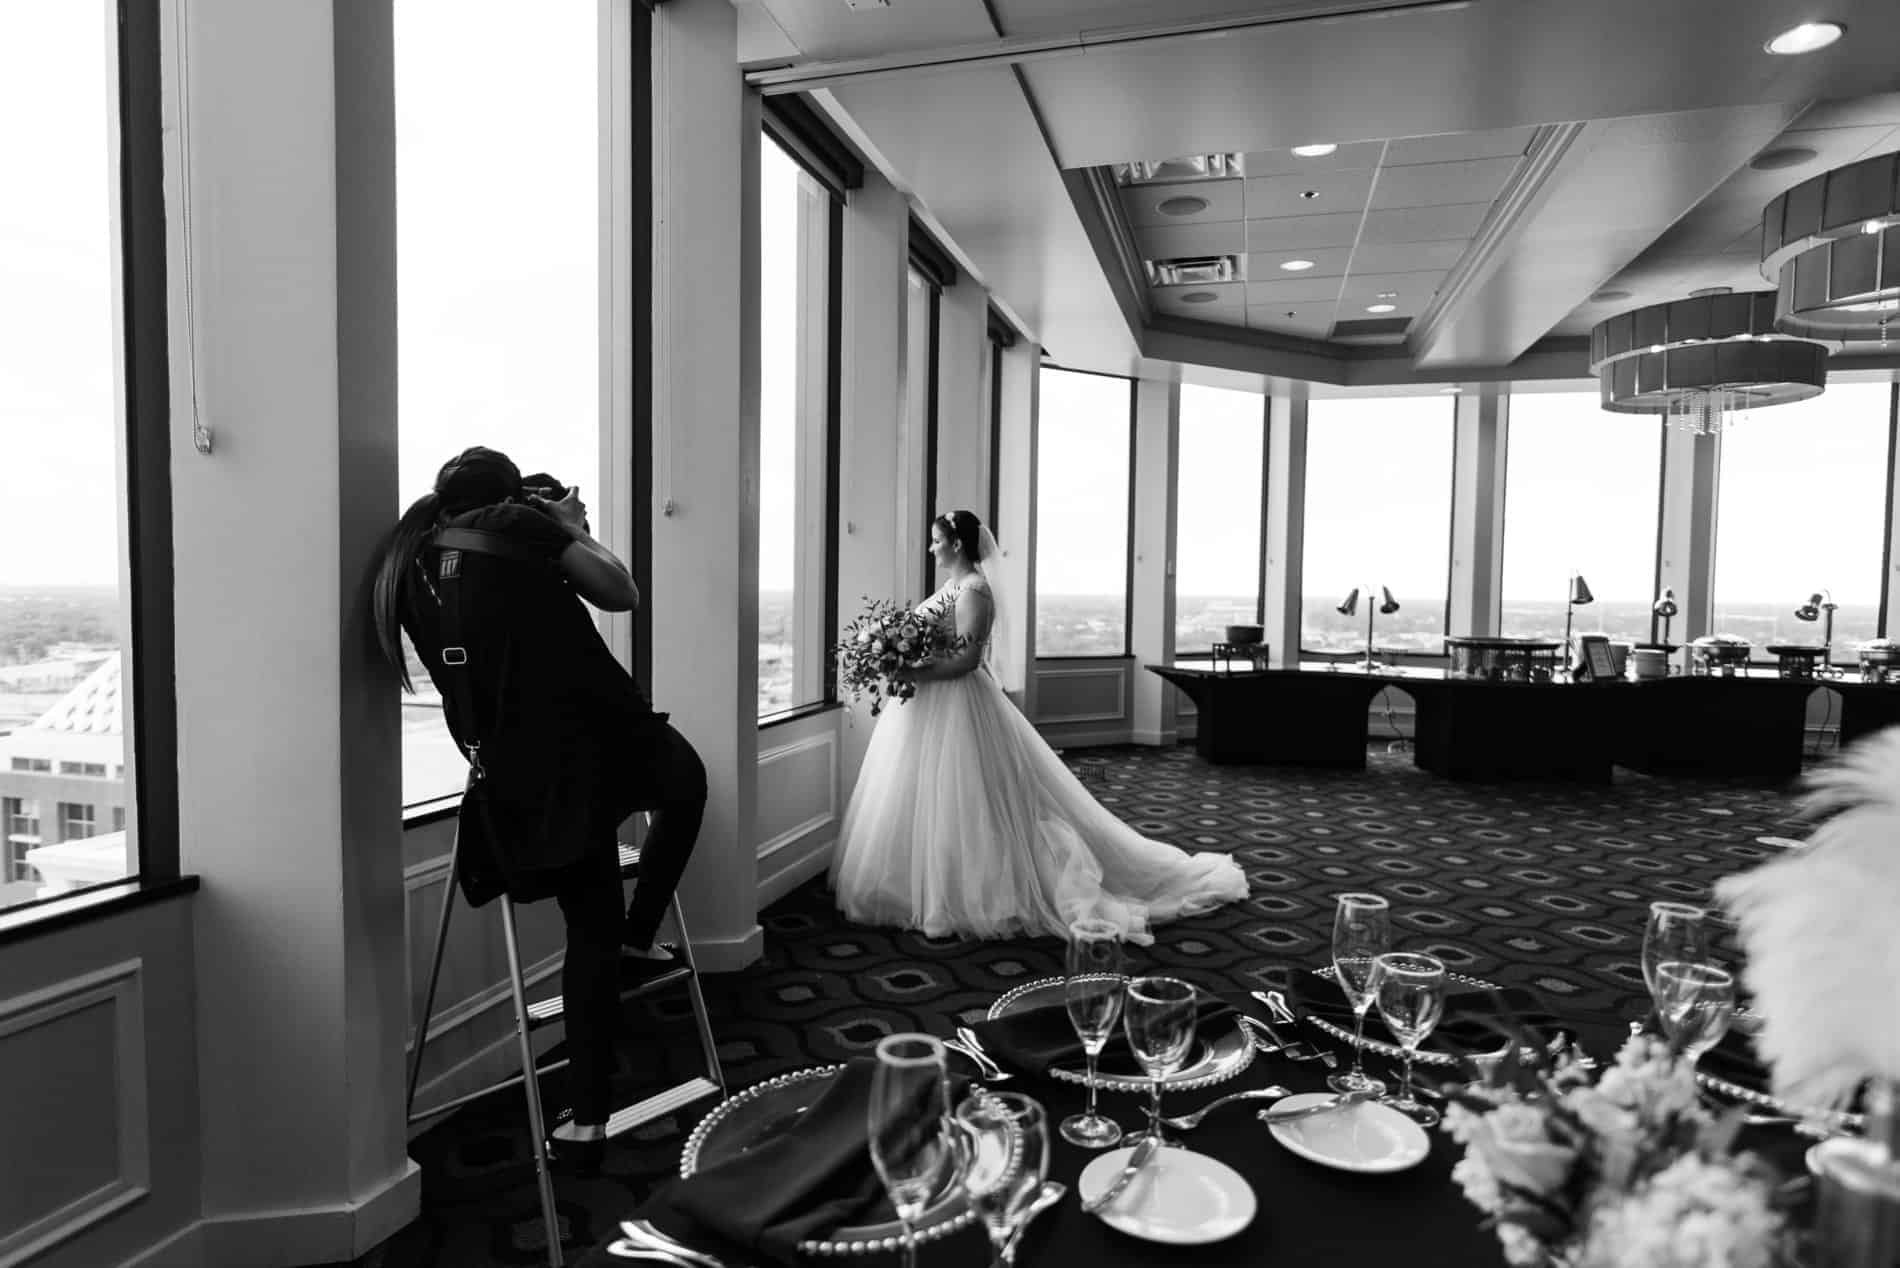 Citrus Club Weddings are amazing when choosing a wedding photographer